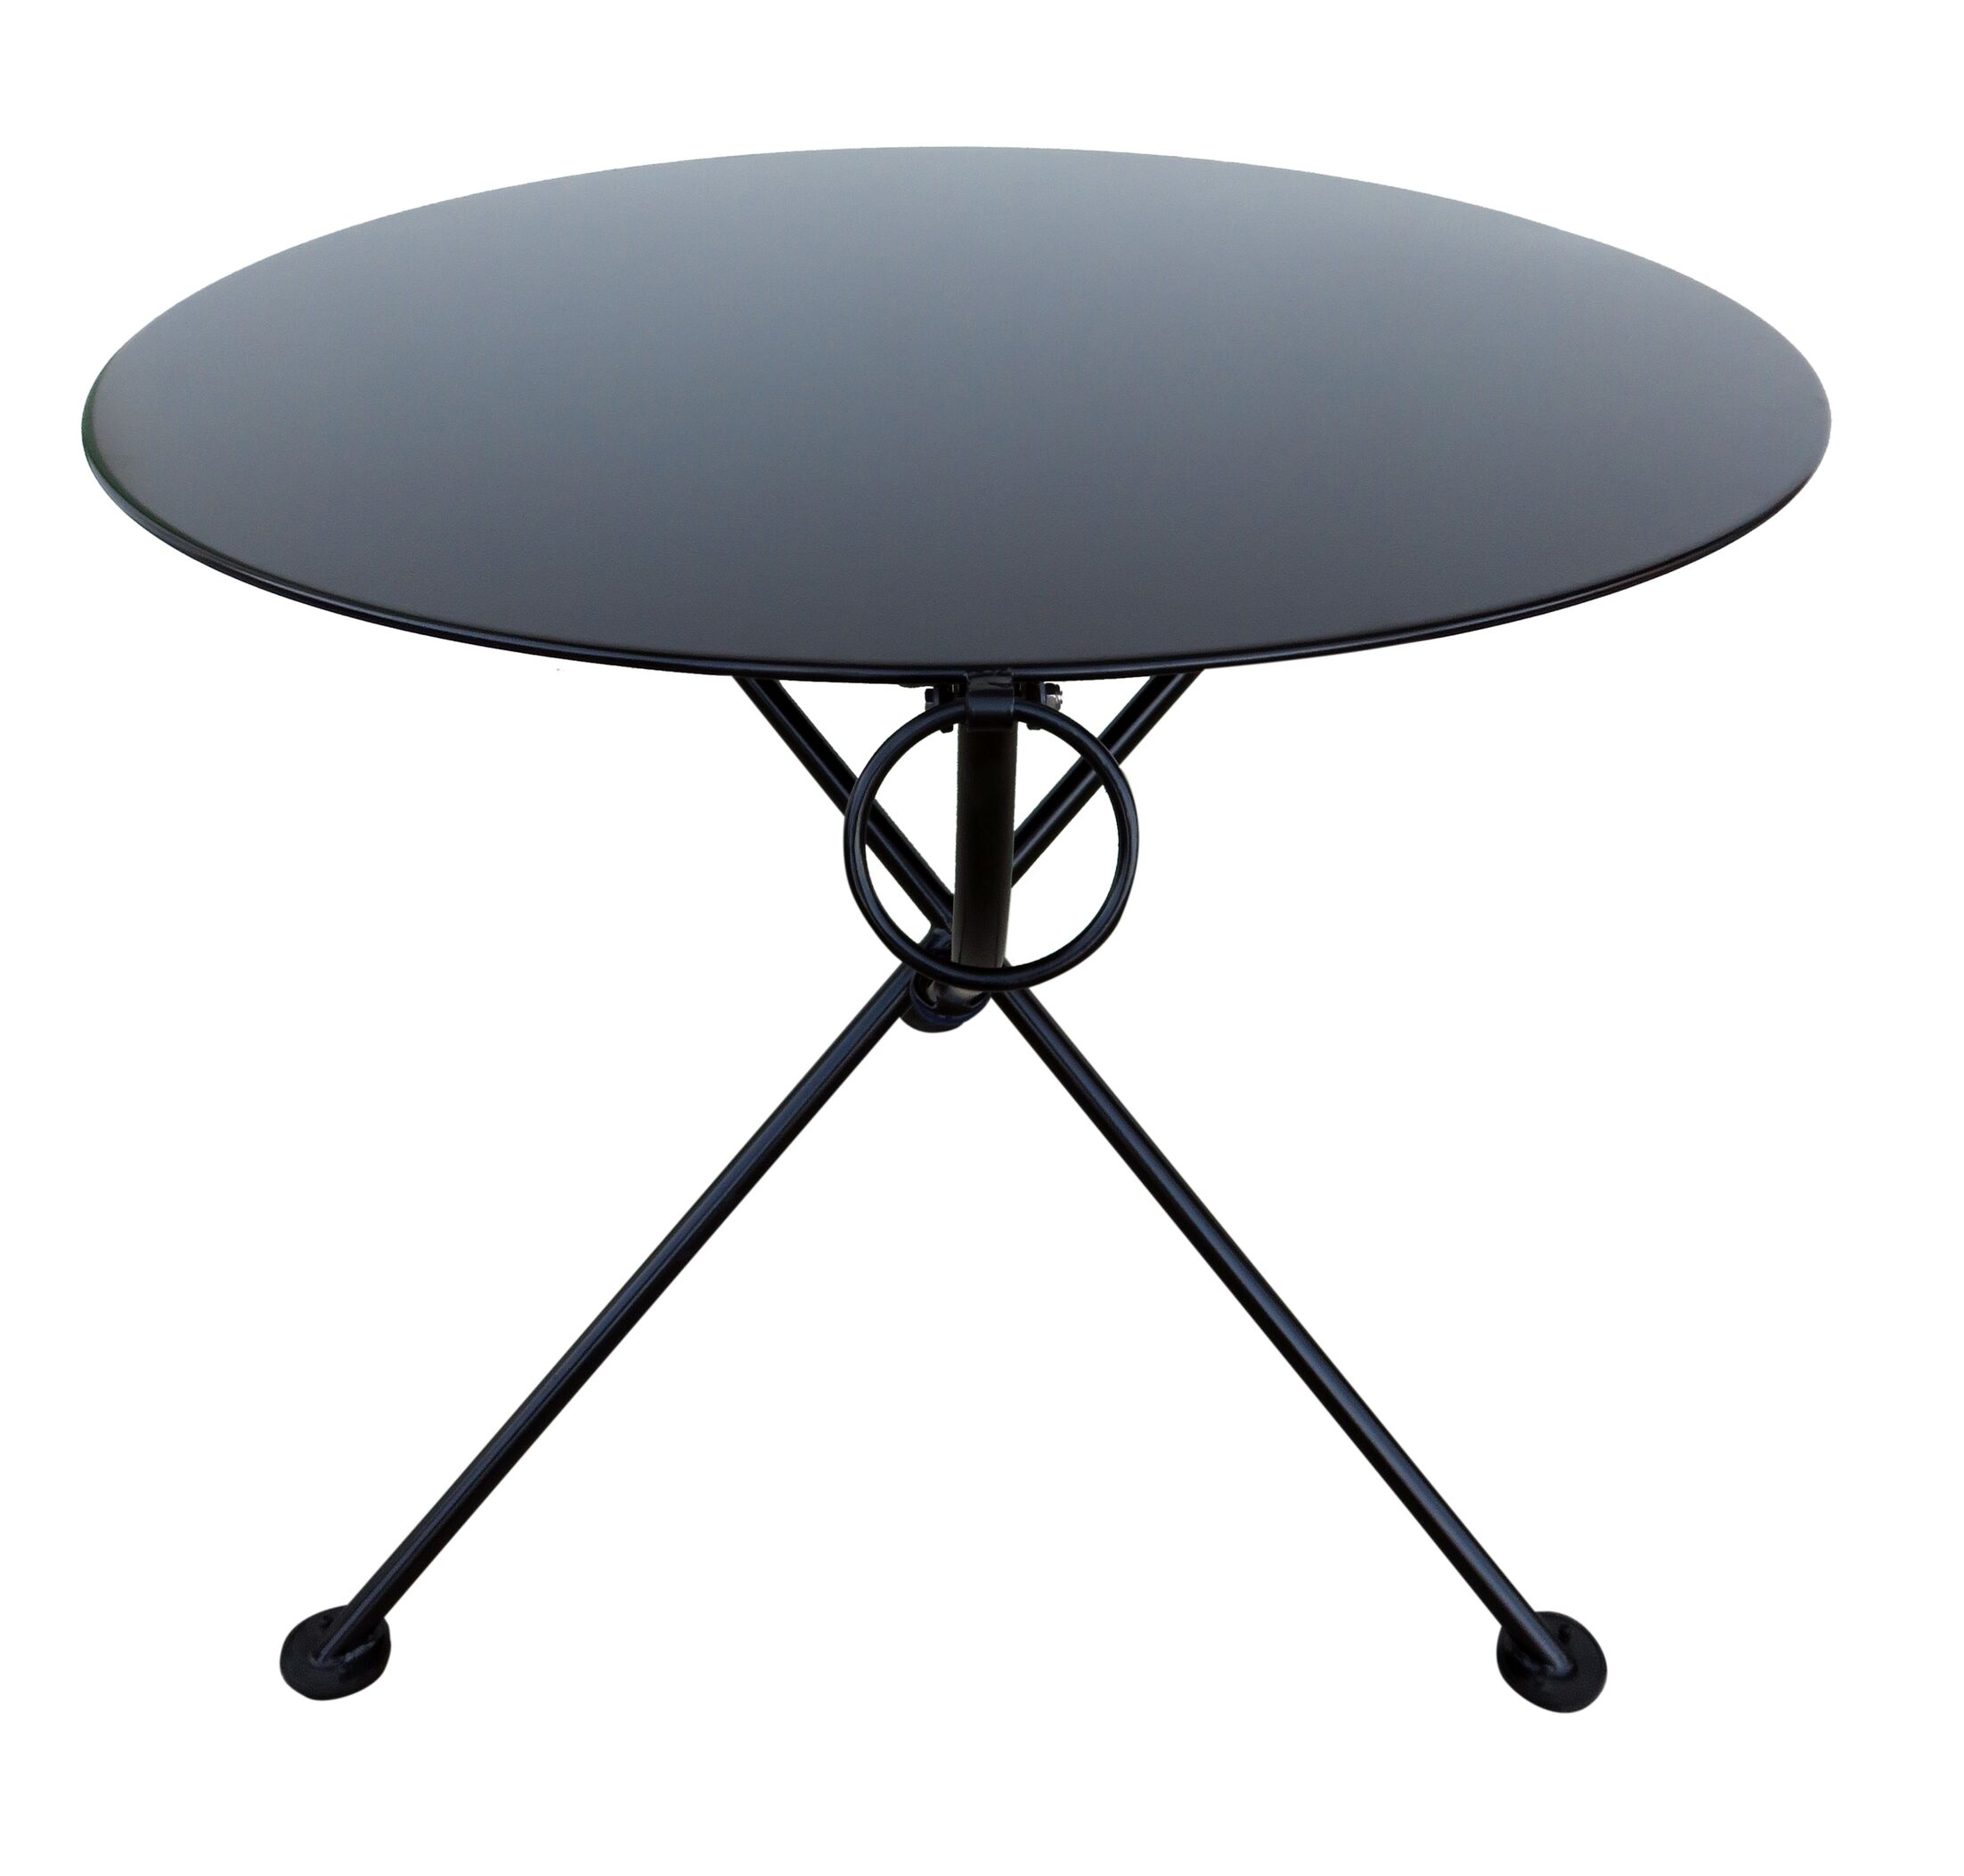 French Caf� Folding Bistro Table Base Color: Jet Black, Table Size: 34